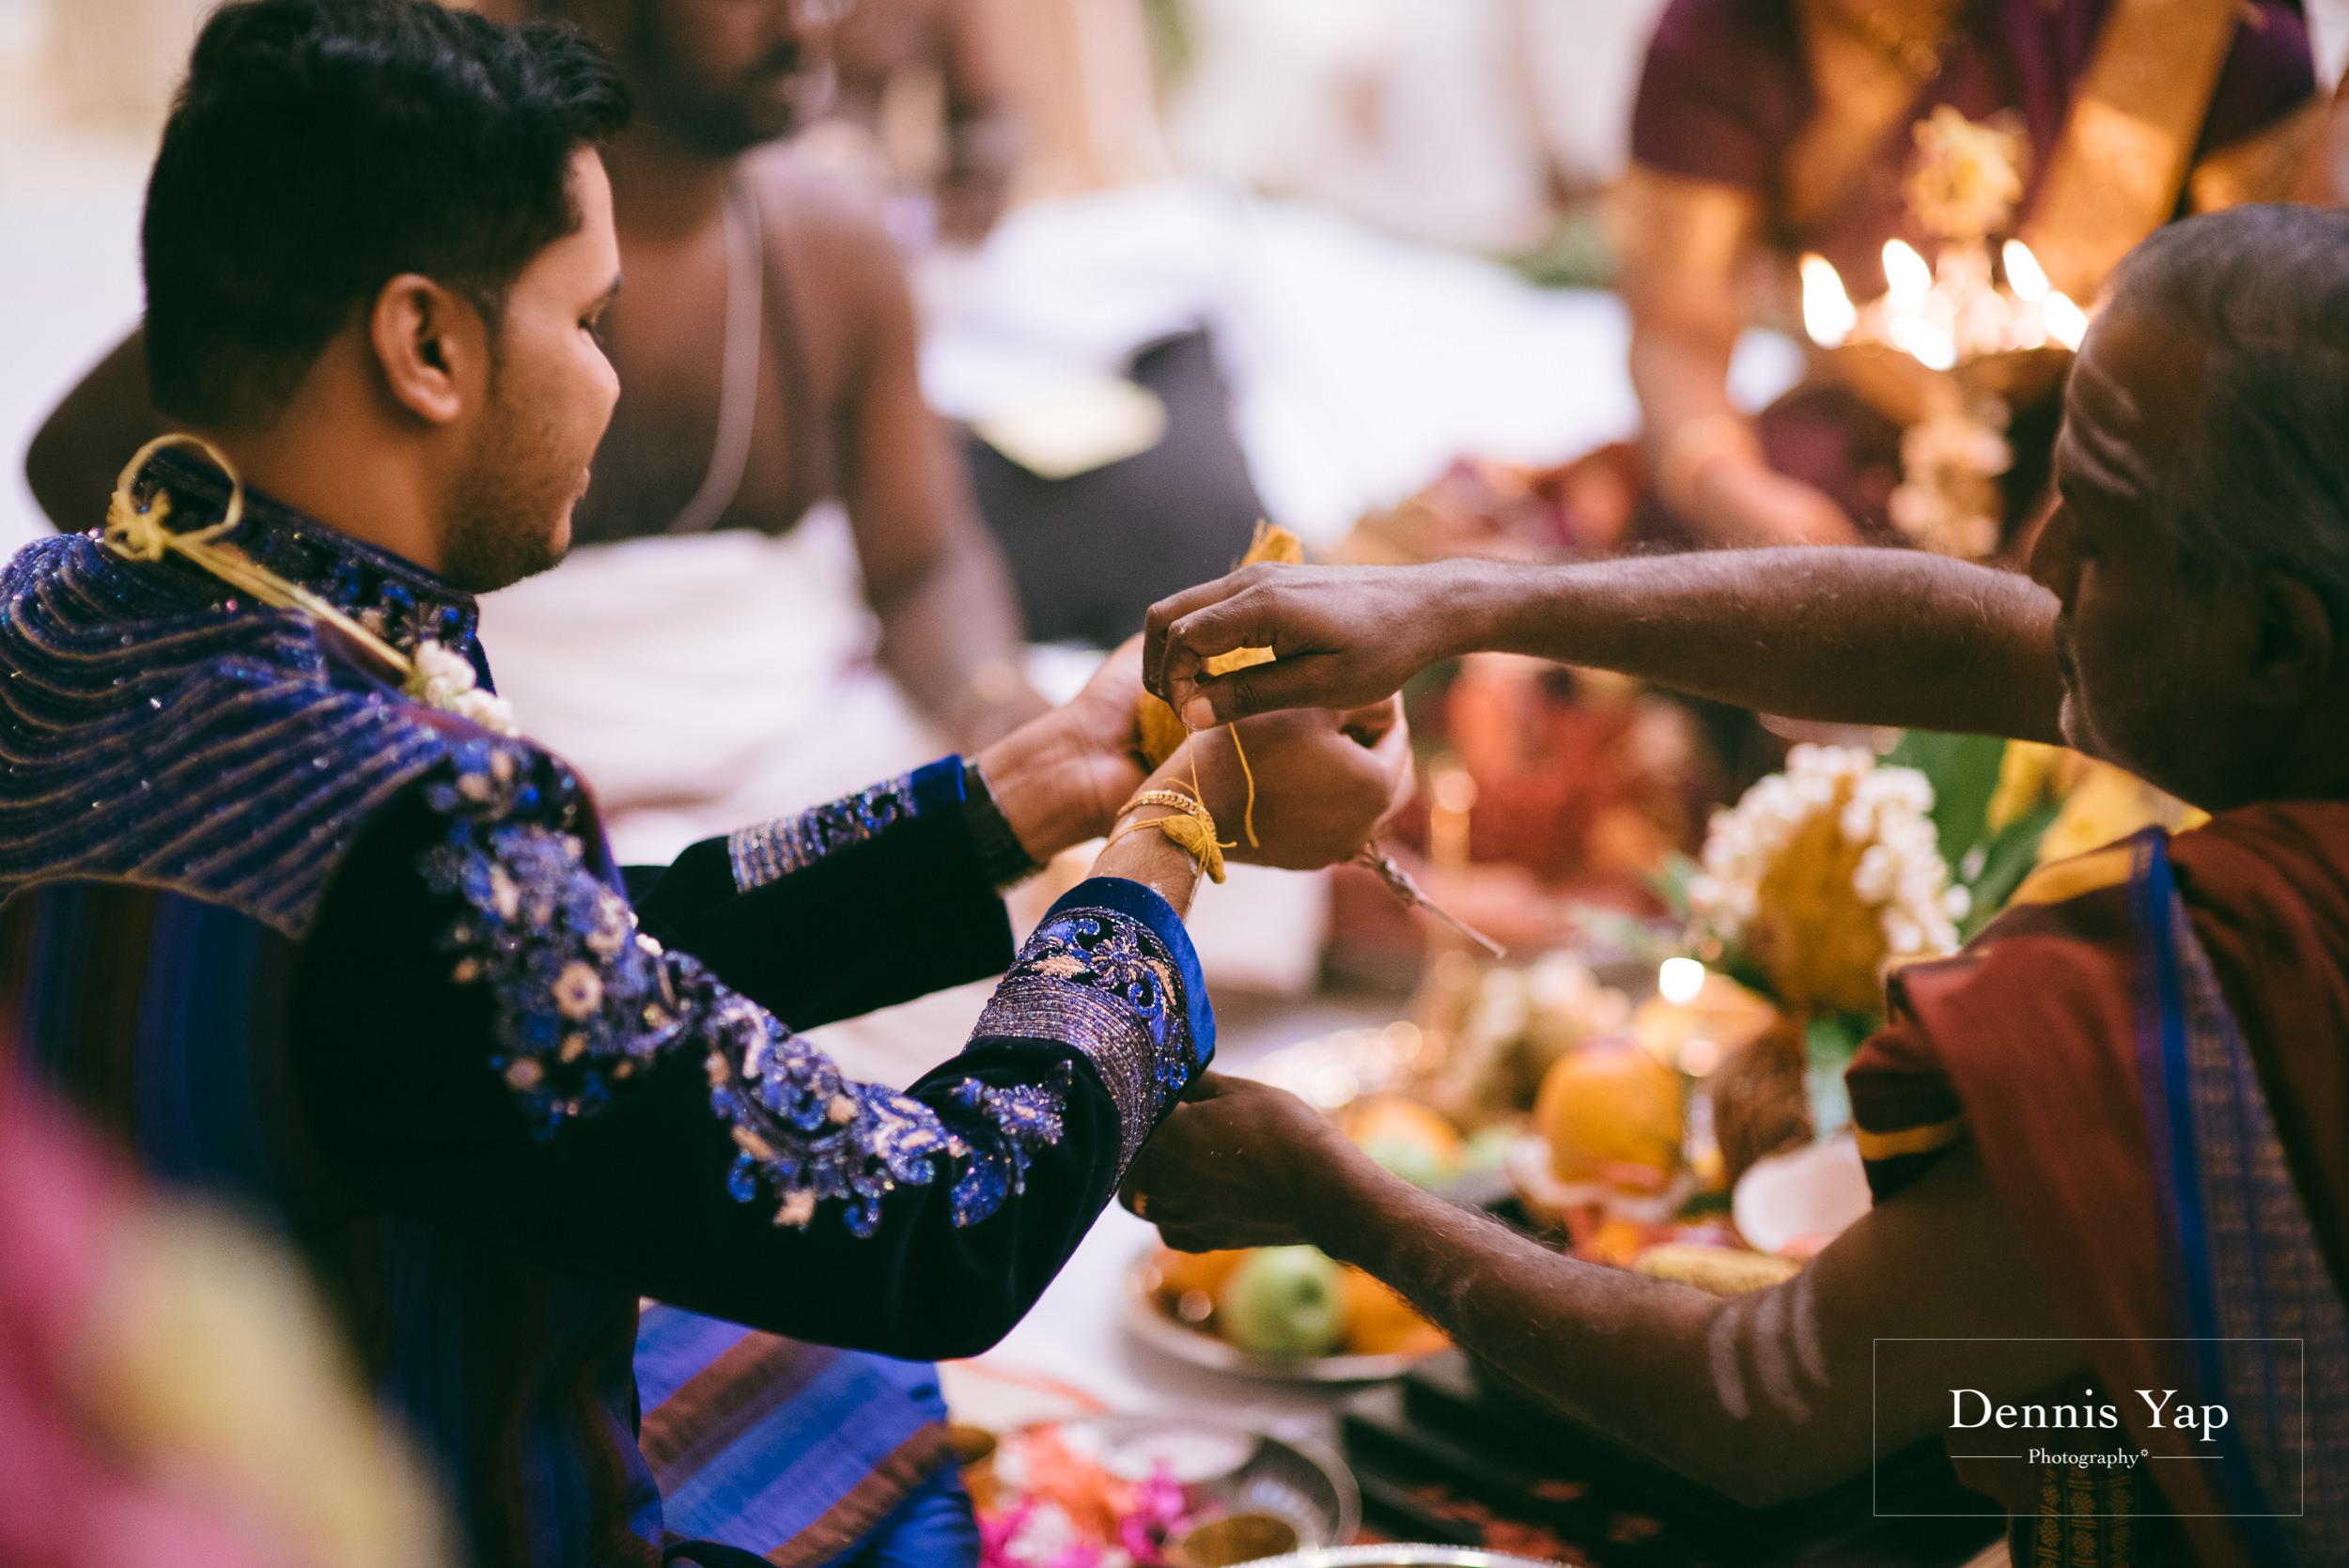 puvaneswaran cangitaa indian wedding ceremony ideal convention dennis yap photography malaysia-12.jpg